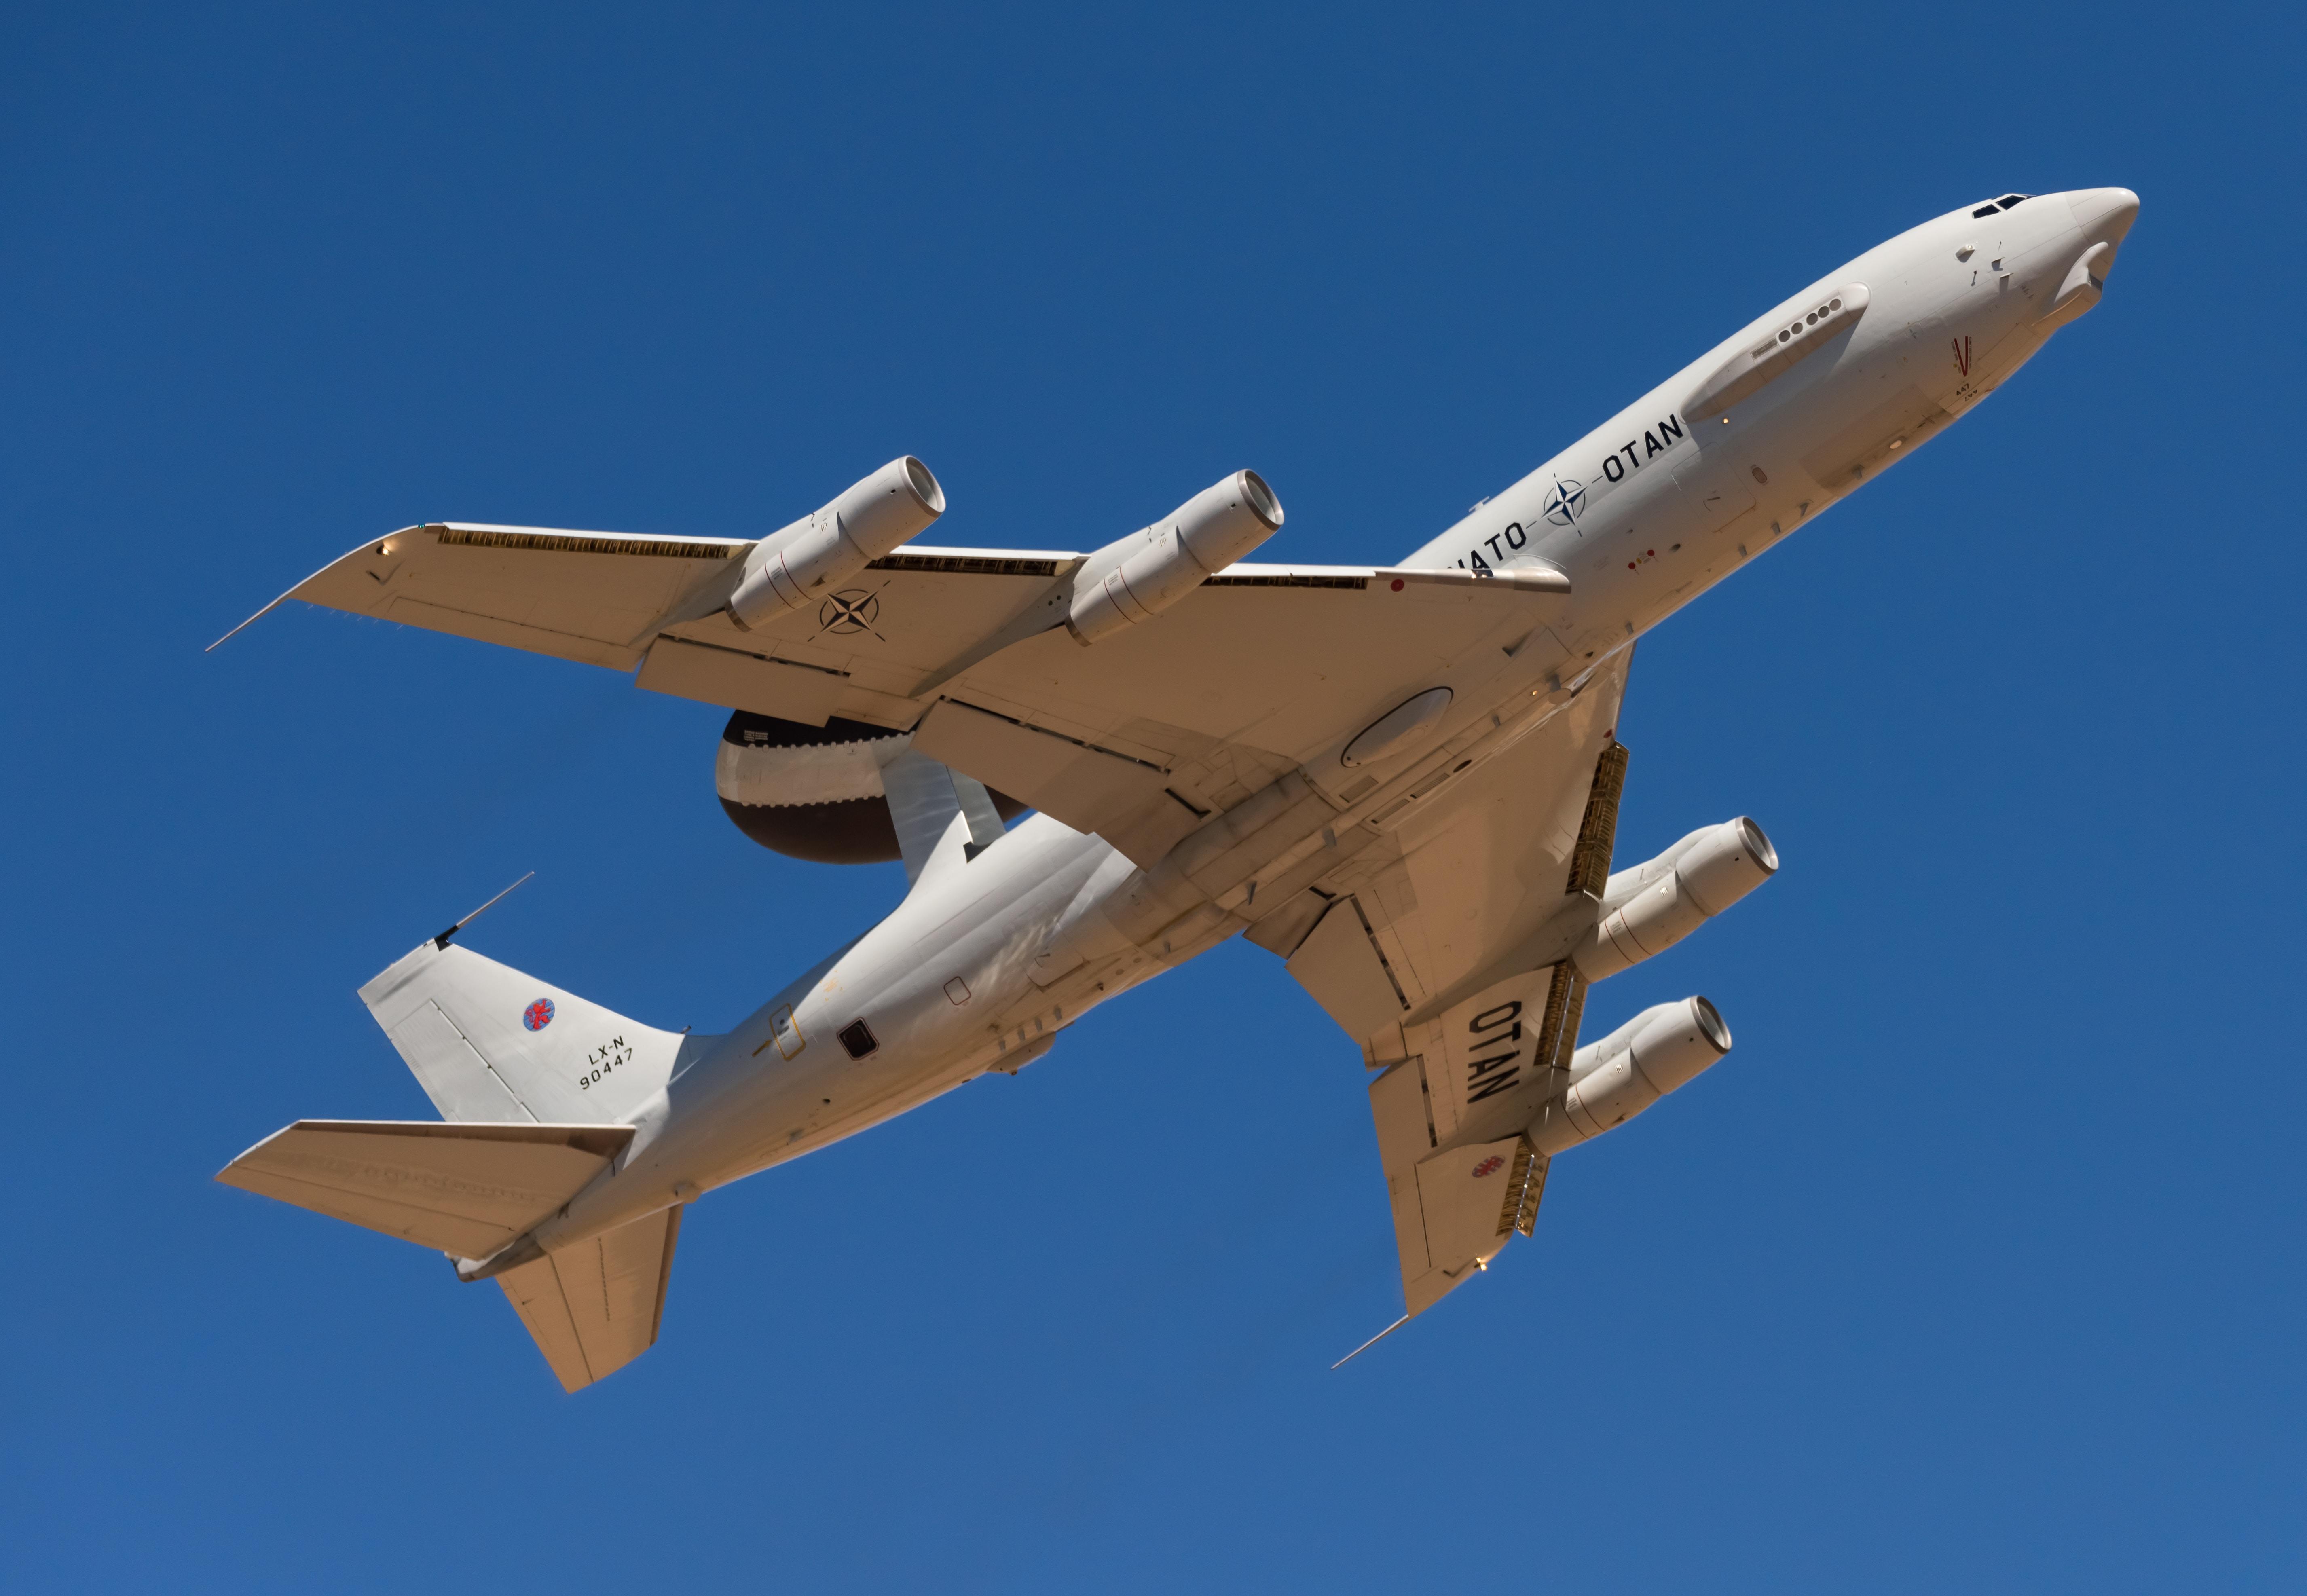 airliner flies on sky